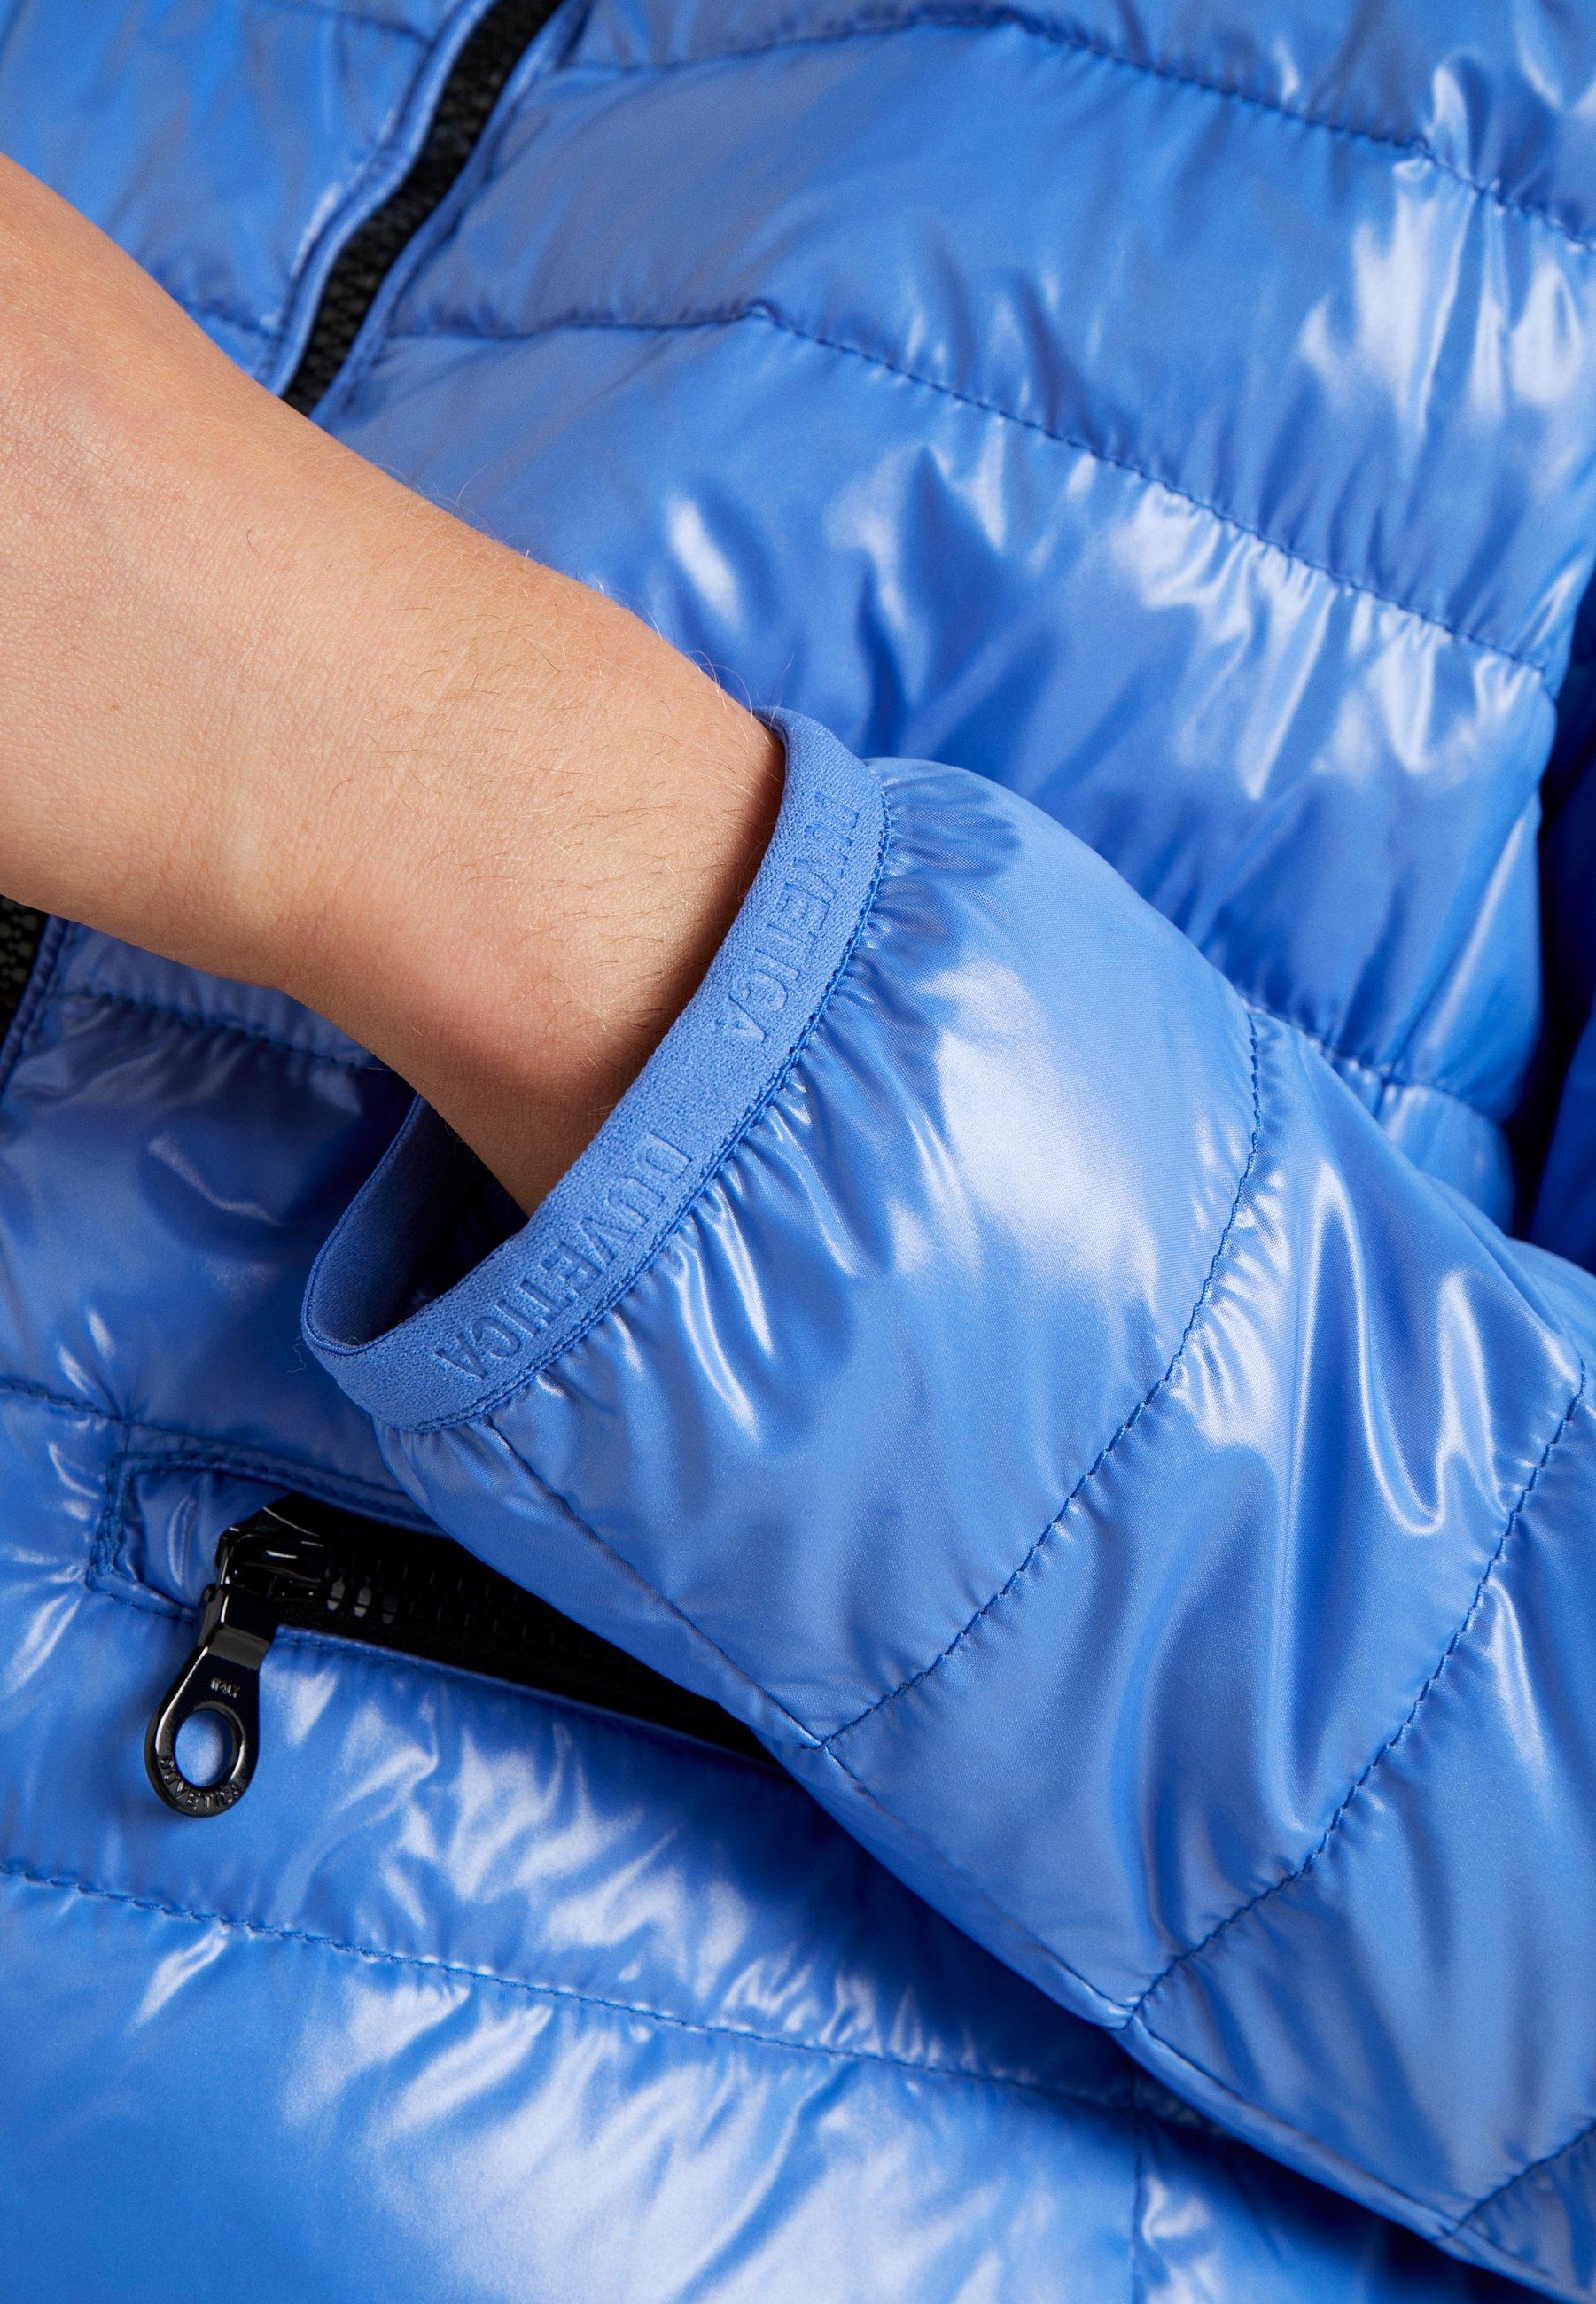 NaosPiumino Duvetica NaosPiumino Blue NaosPiumino Blue Blue Duvetica Ciano Ciano Ciano Duvetica Duvetica 0nPwkO